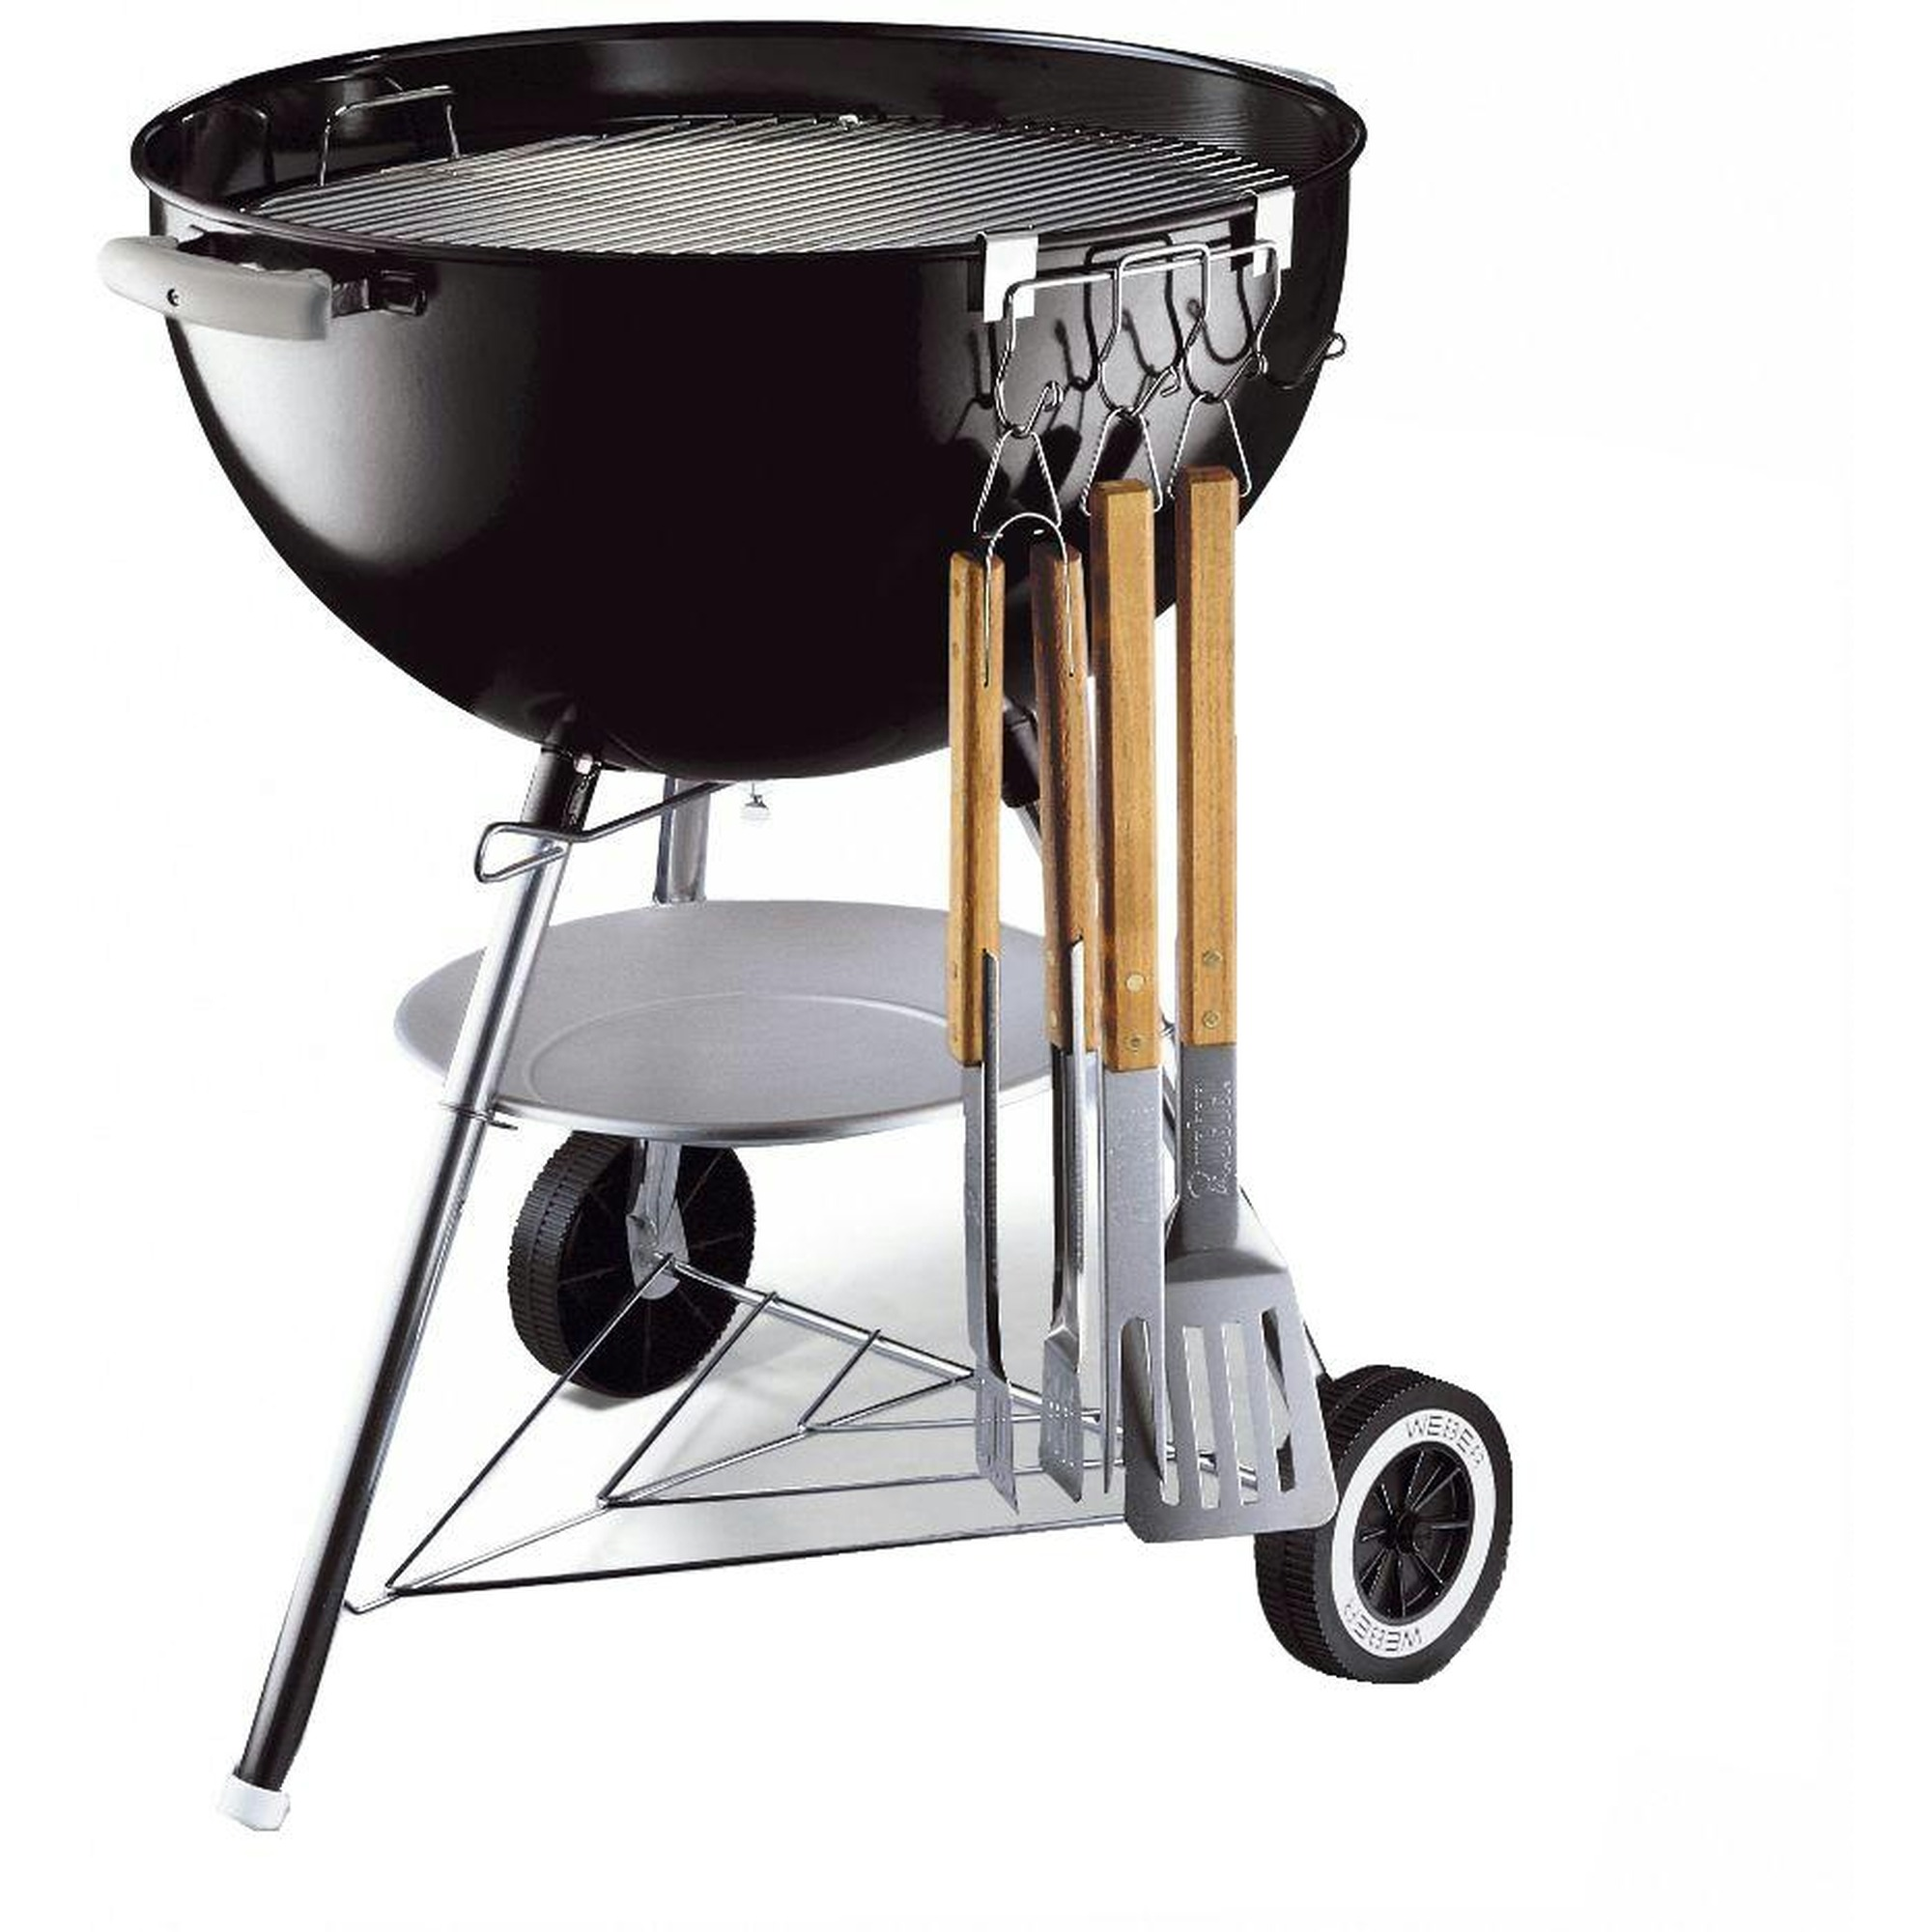 Weber gereedschaphouder t.b.v. houtskool barbecue staal